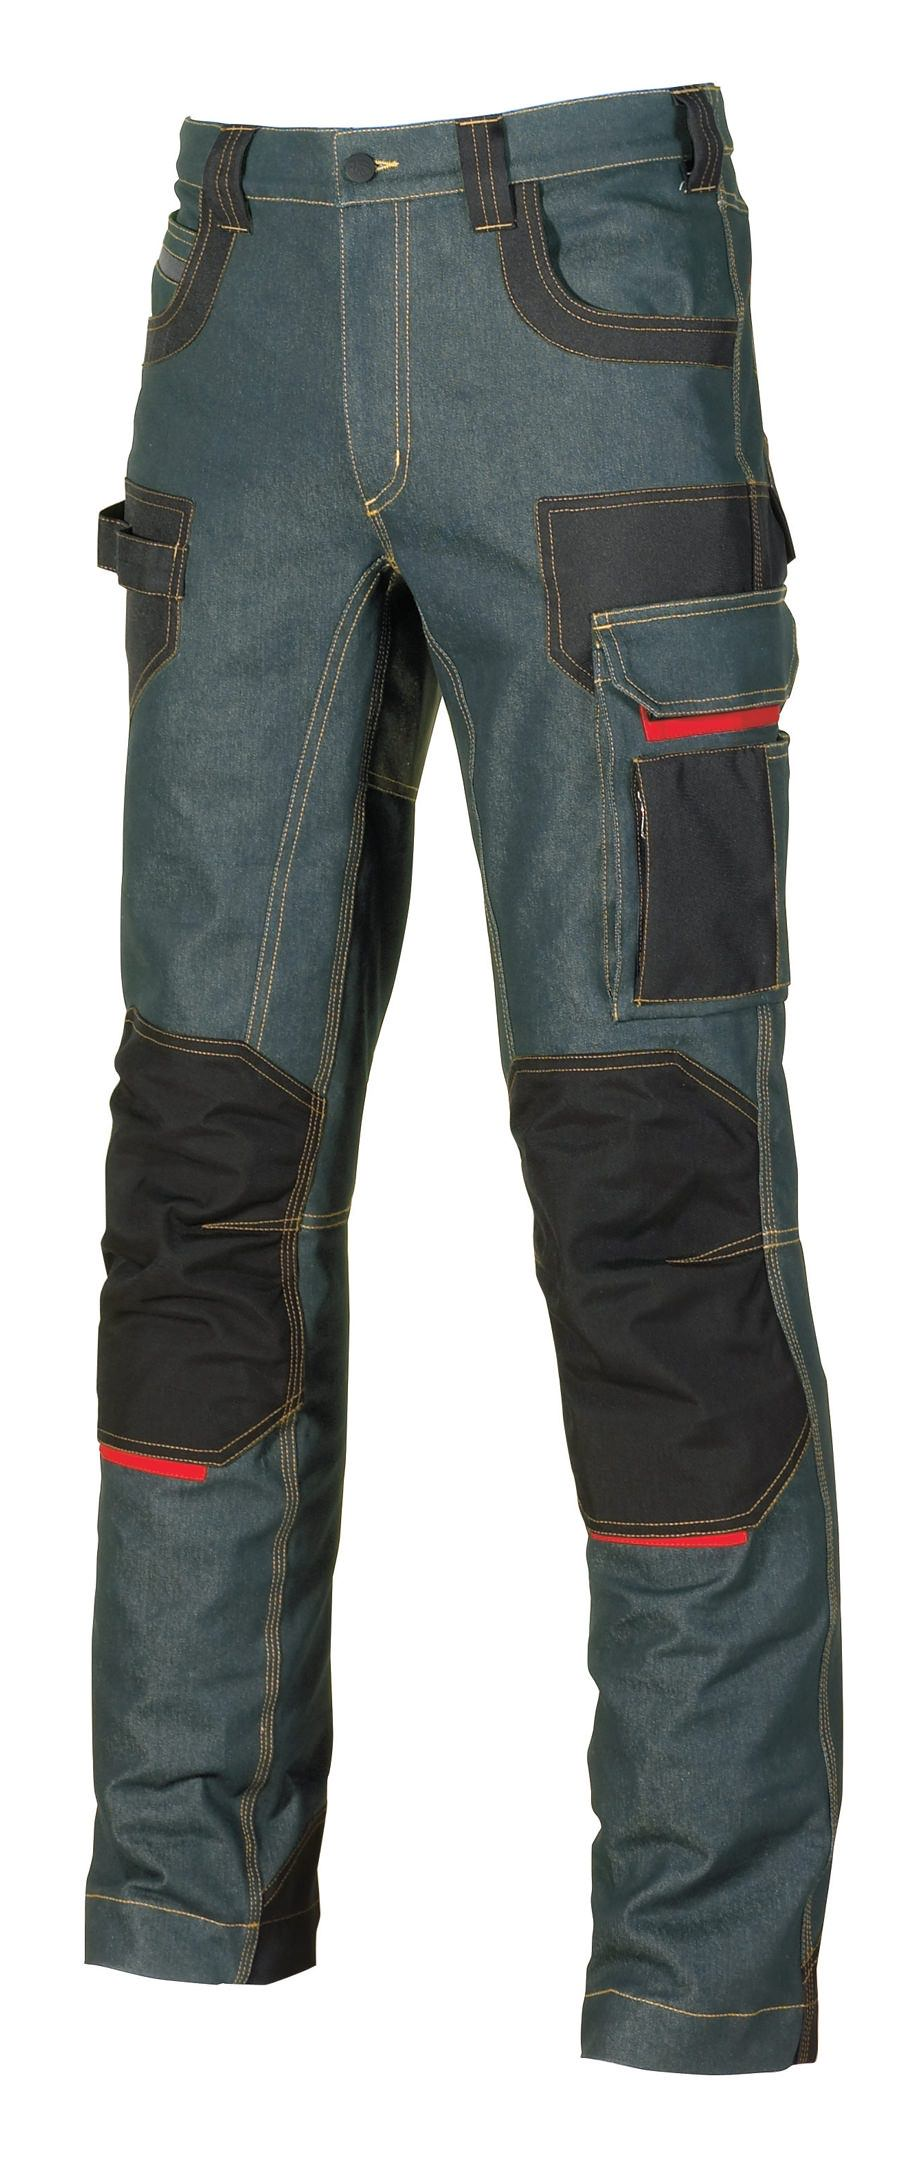 U-Power Jeanshose Platinum Button Rust Jeans Größe 54 - EX069RJ/54